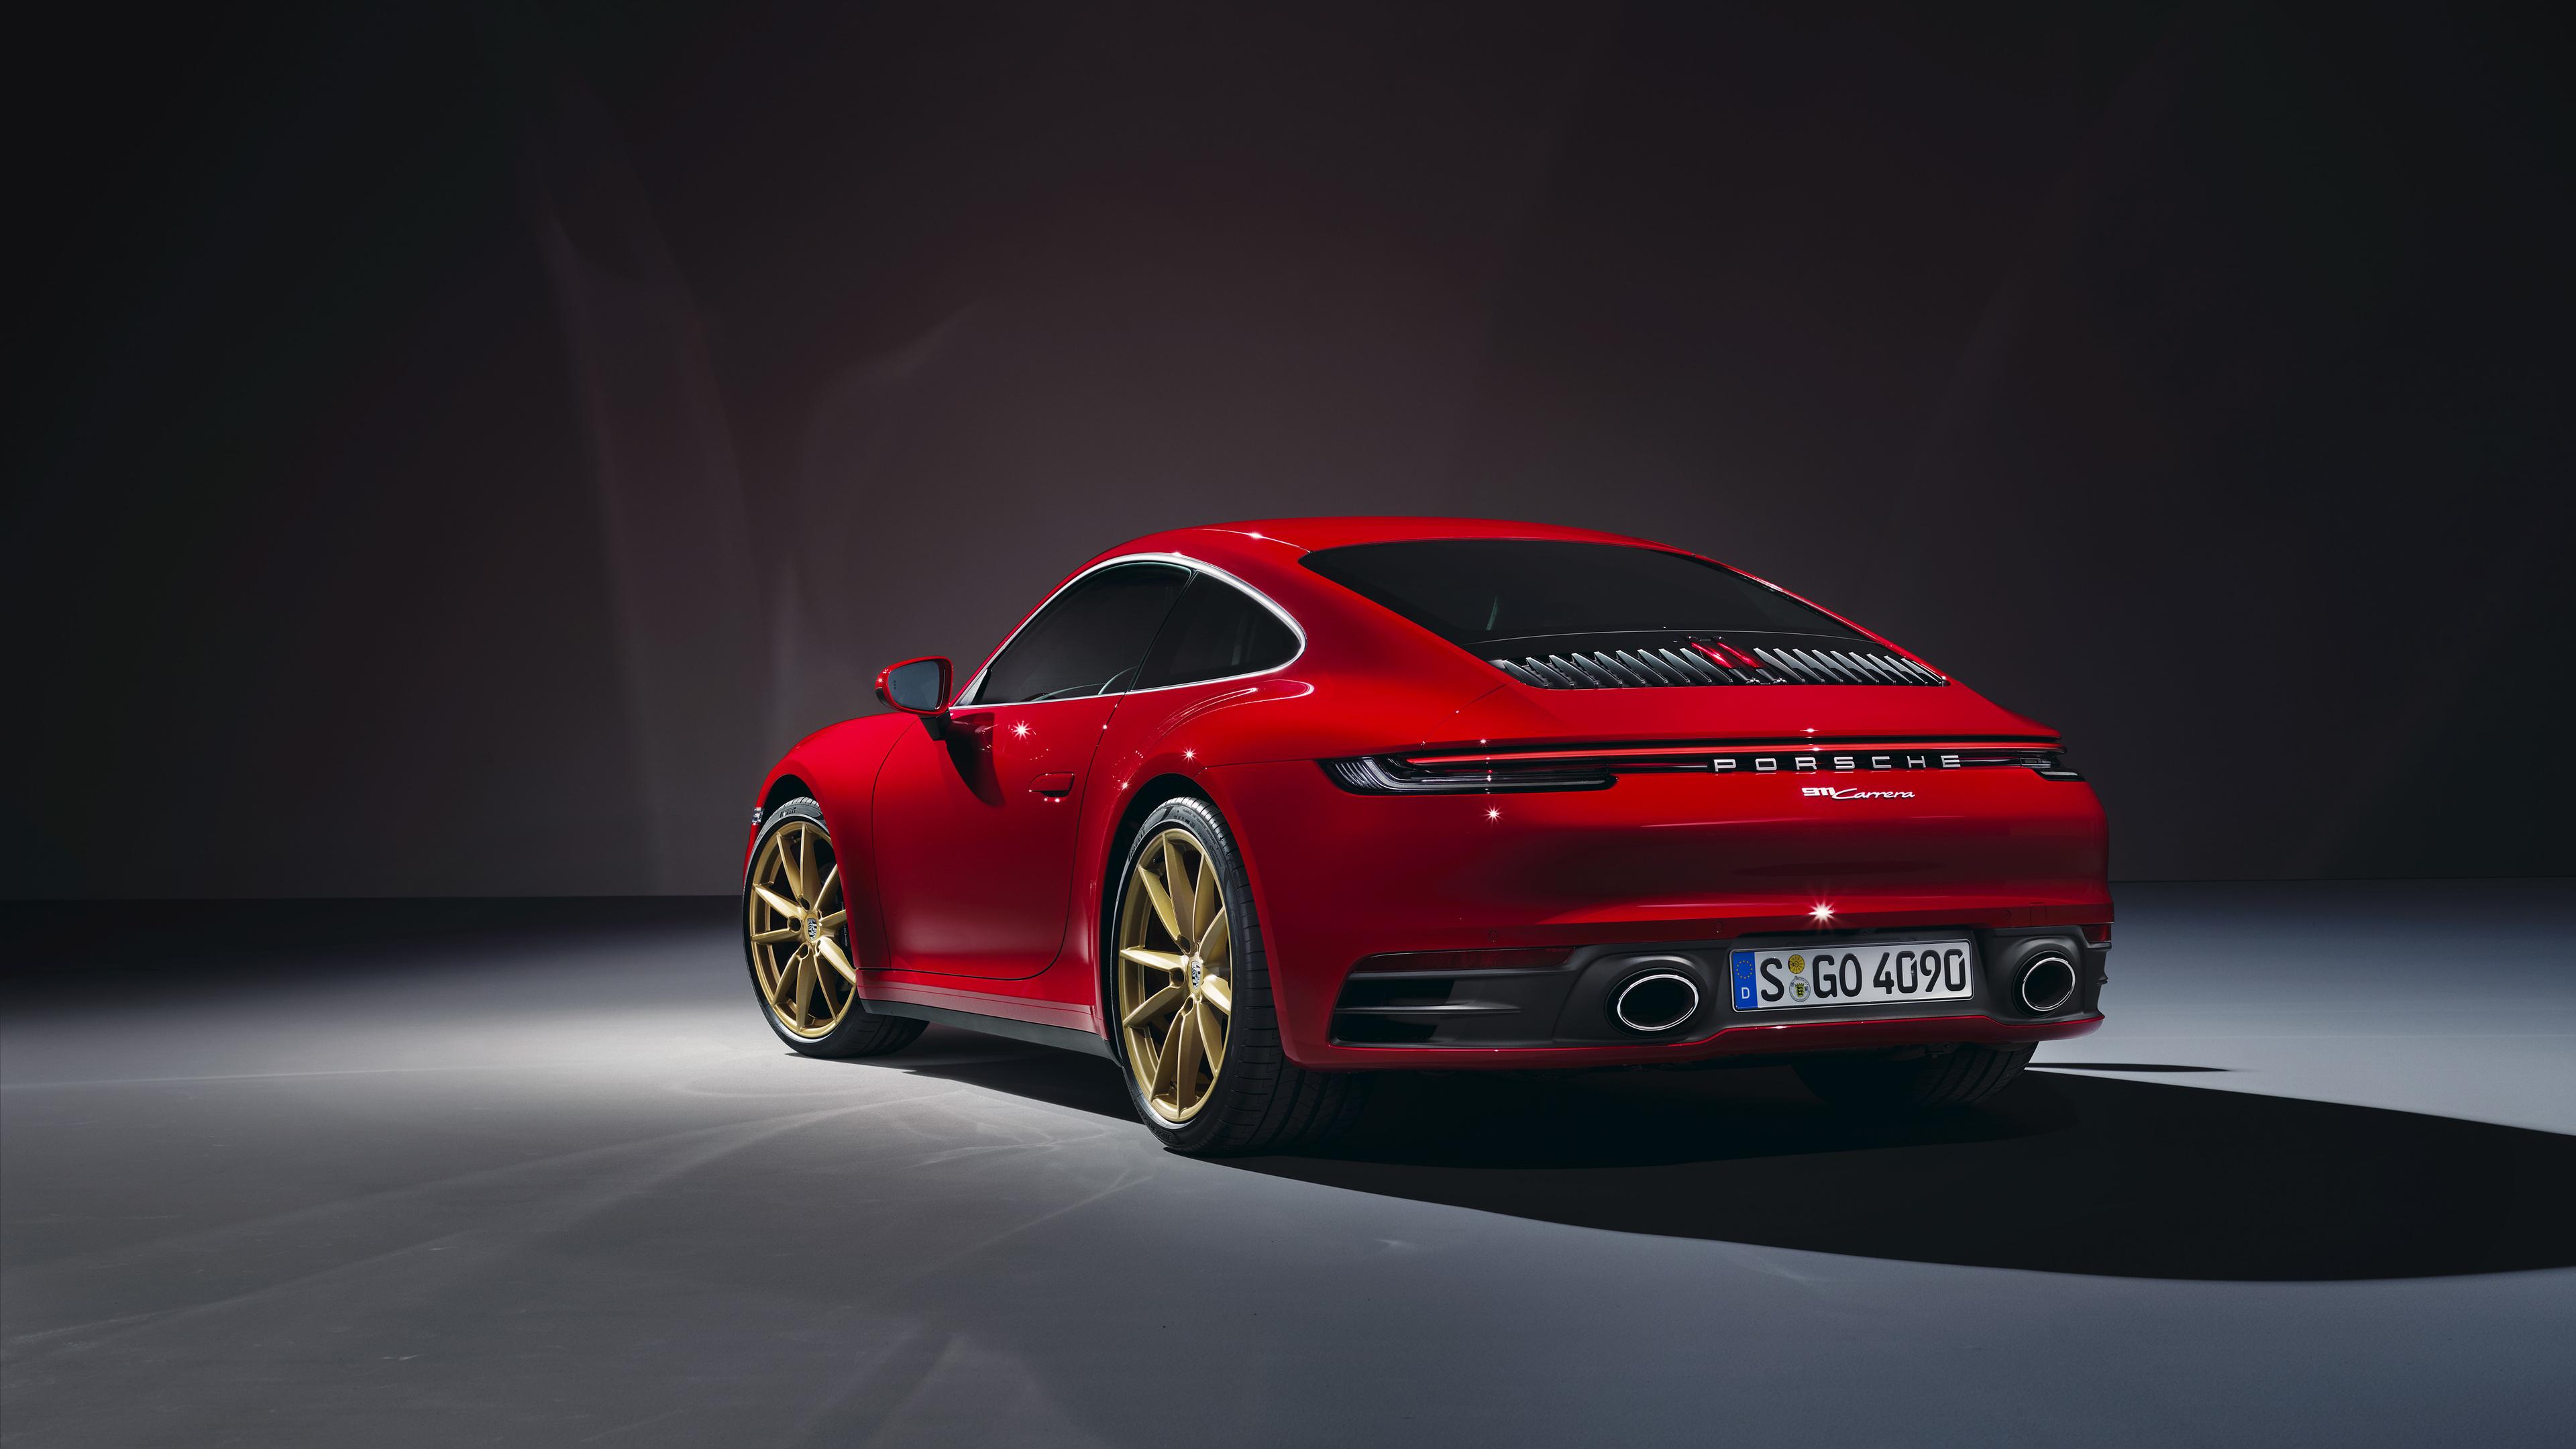 porsche 911 carrera 2019 1569188380 - Porsche 911 Carrera 2019 - porsche wallpapers, porsche carrera wallpapers, hd-wallpapers, cars wallpapers, 4k-wallpapers, 2019 cars wallpapers